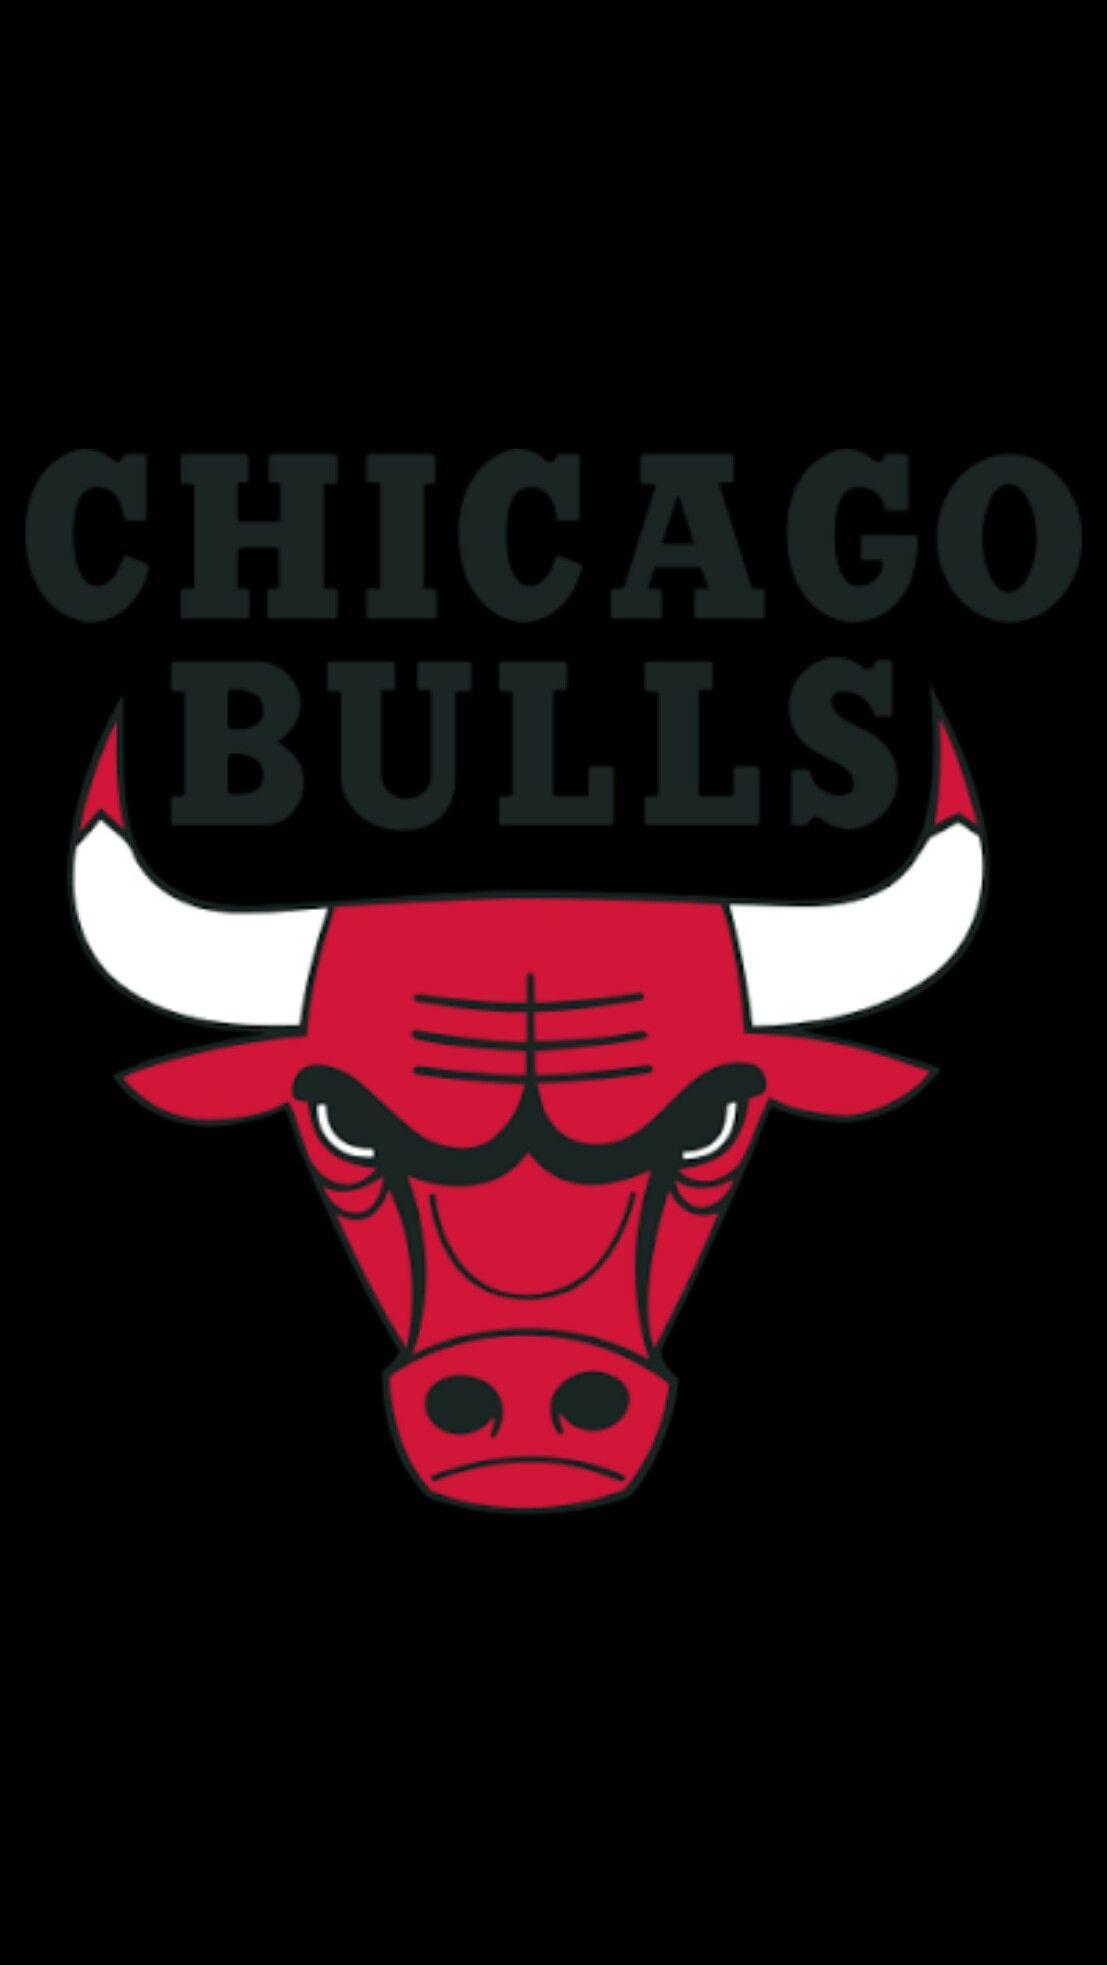 Nba Wallpaper Iphone Android Chicago Bulls Basketball Bulls